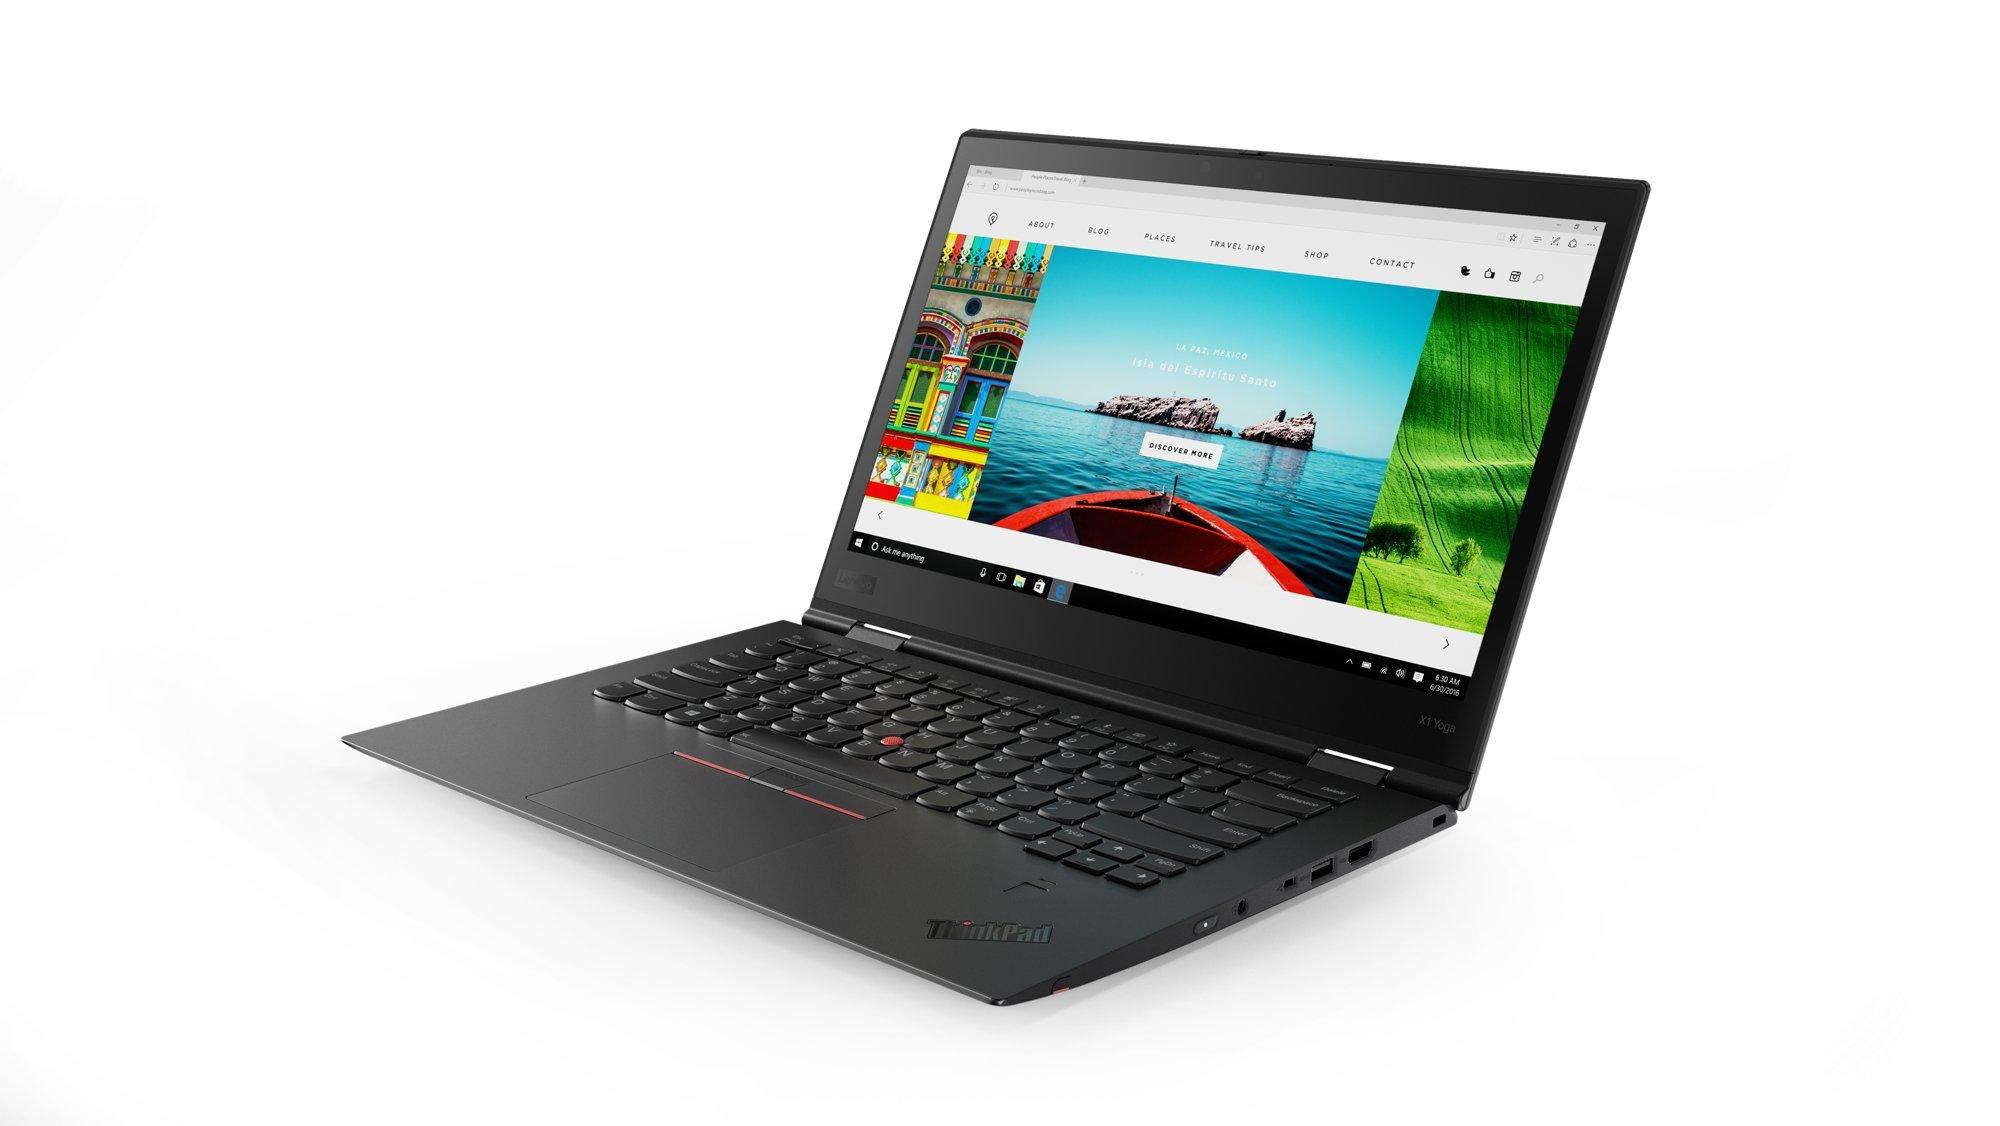 Lenovo 14″ ThinkPad X1 Yoga 3rd Gen Touchscreen LCD 2 in 1 Ultrabook Intel Core i7 (8th Gen) i7-8550U Quad-core (4 Core) 1.8GHz 8GB LPDDR3 256GB SSD Windows 10 Pro 64-bit (English) Black, 20LD001KUS